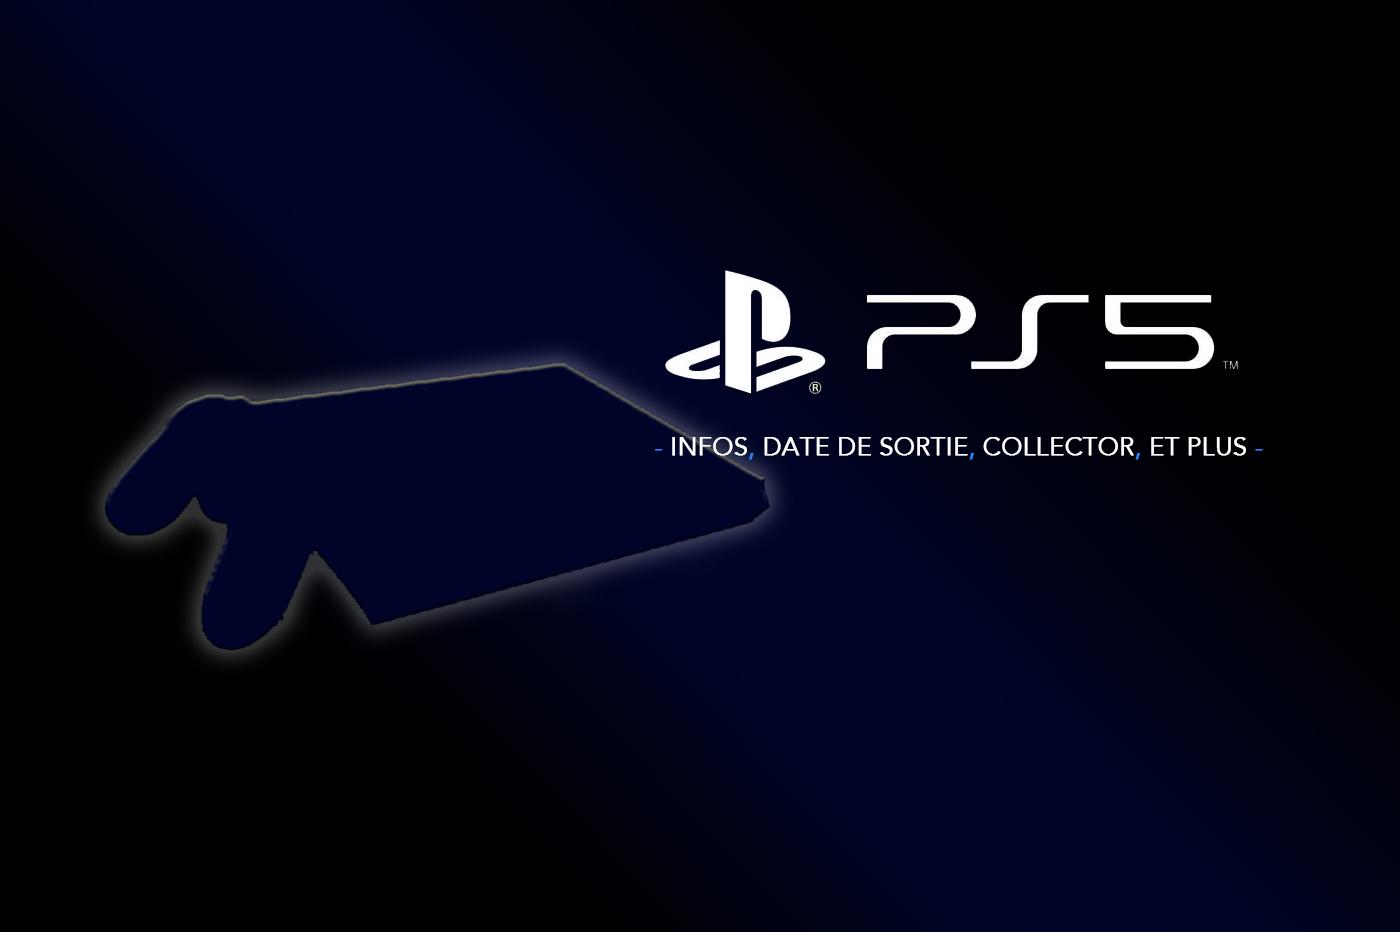 PS5 Infos, dates, prix, collector...